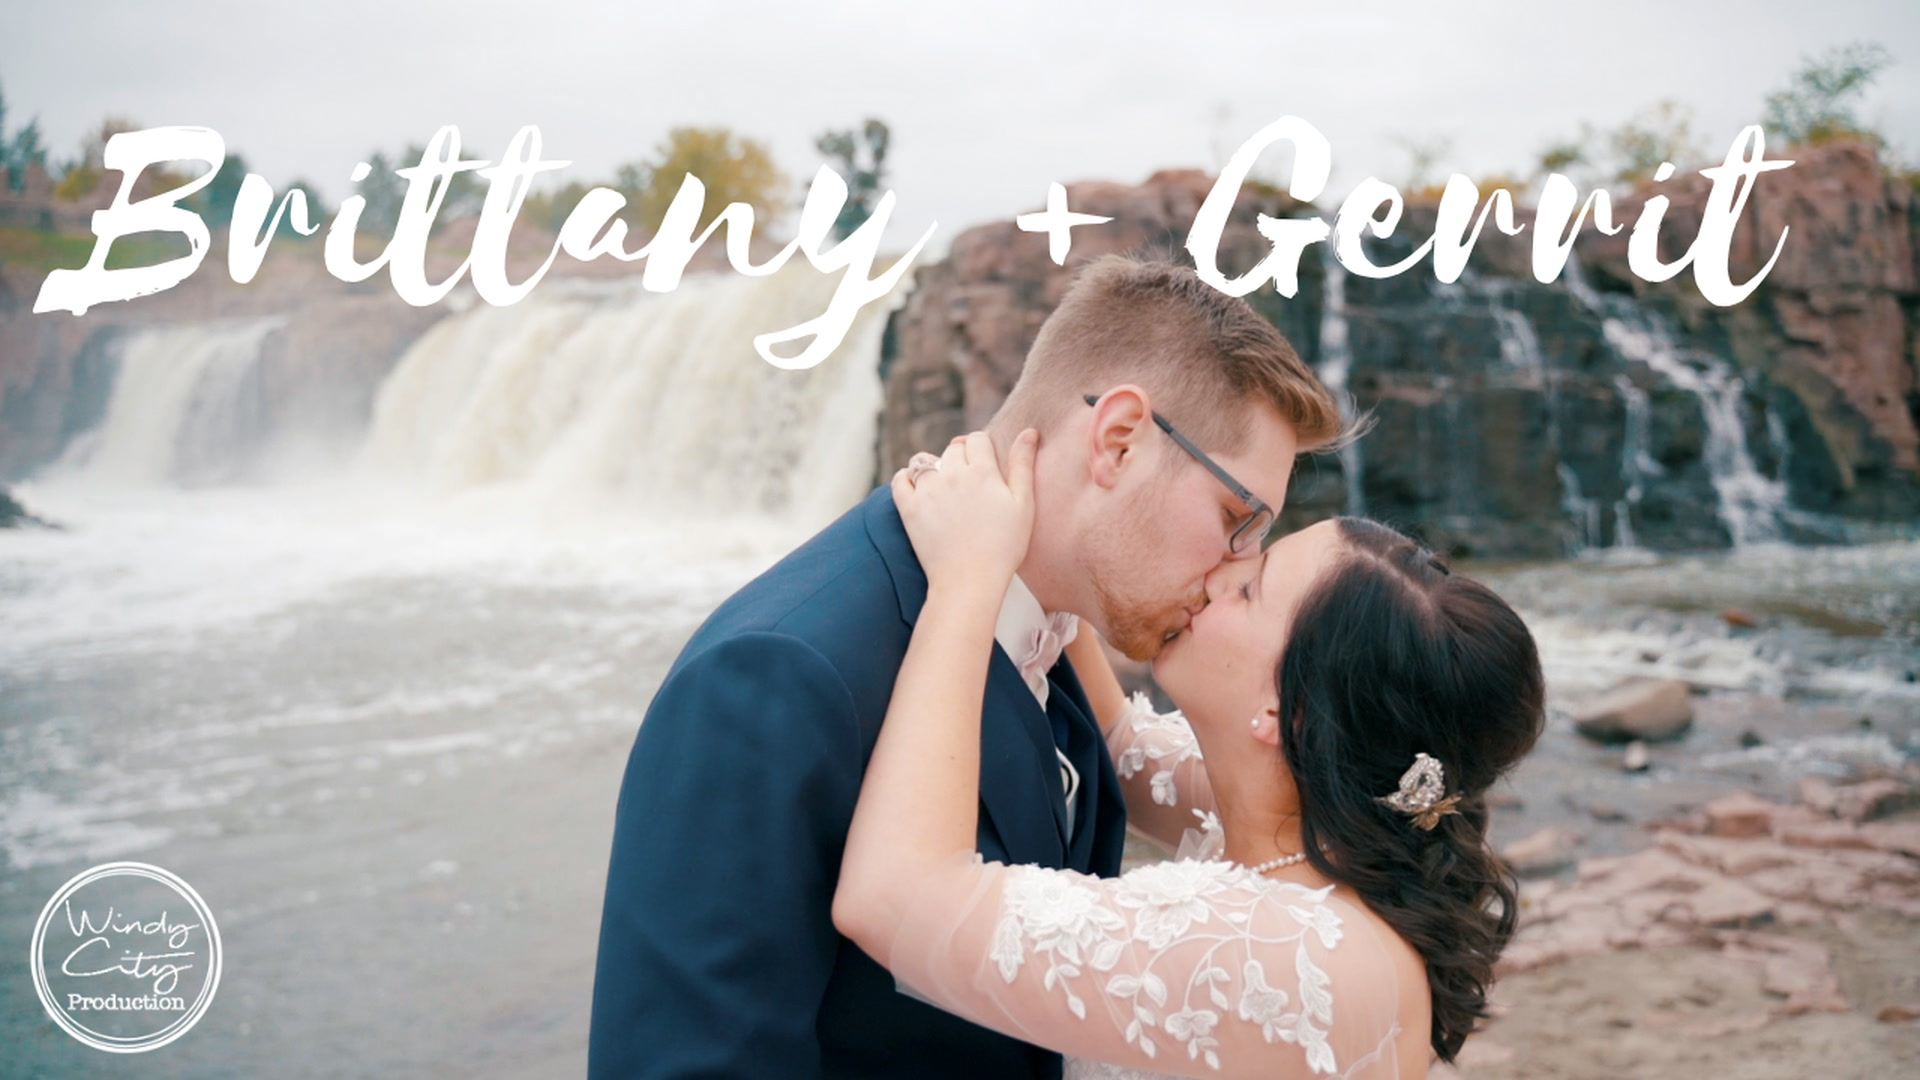 Brittany + Garrit | Sioux Falls, South Dakota | Strawbale Winery